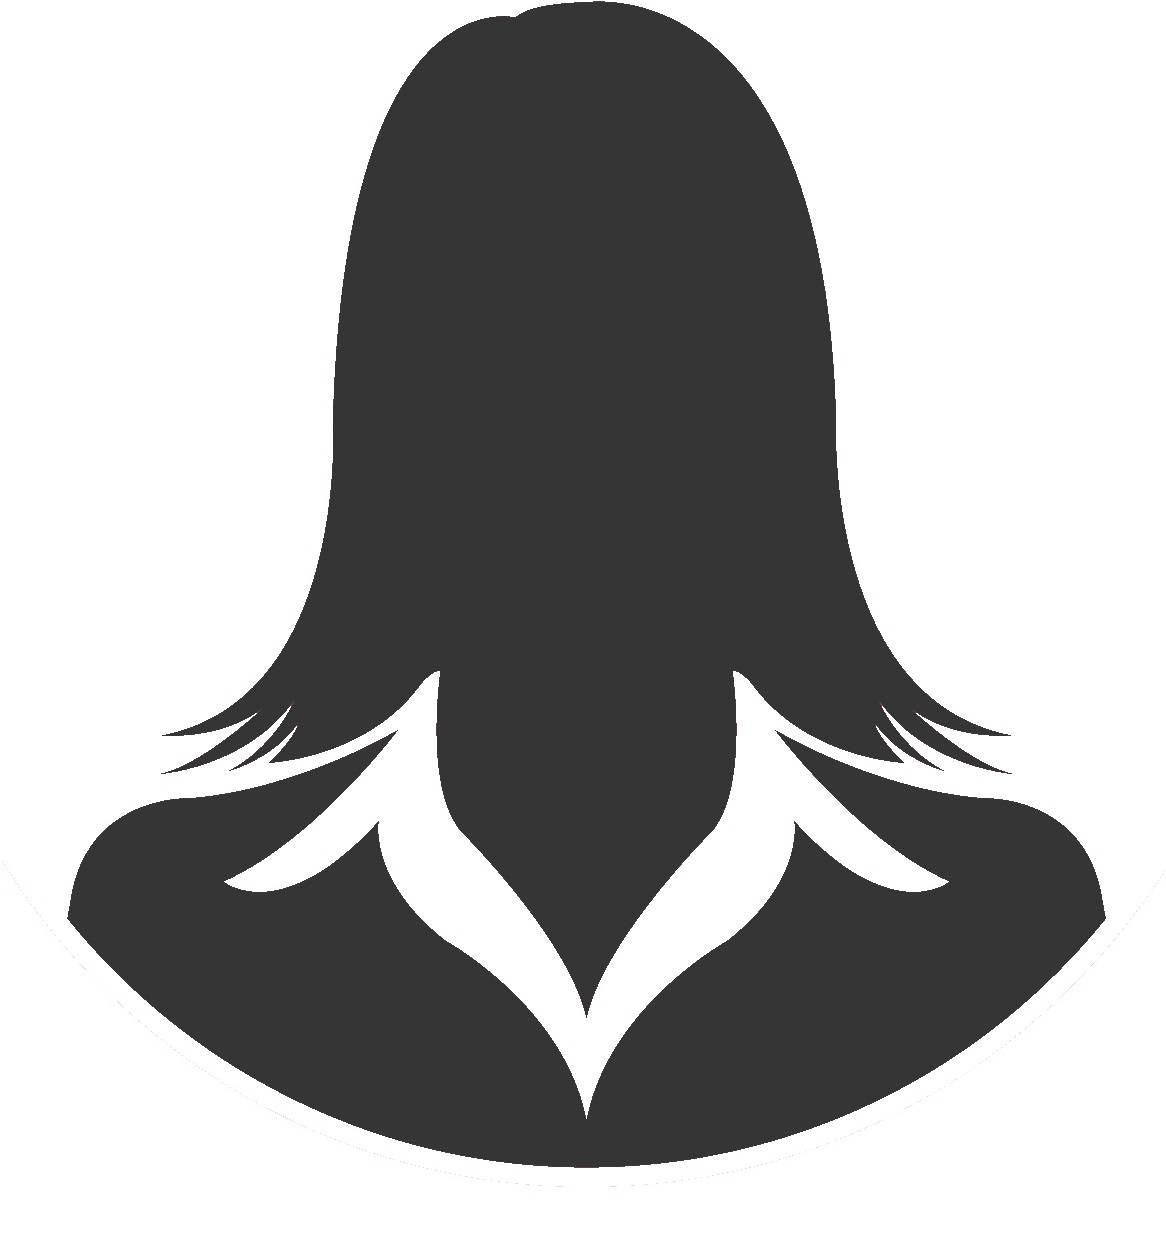 advisor Image